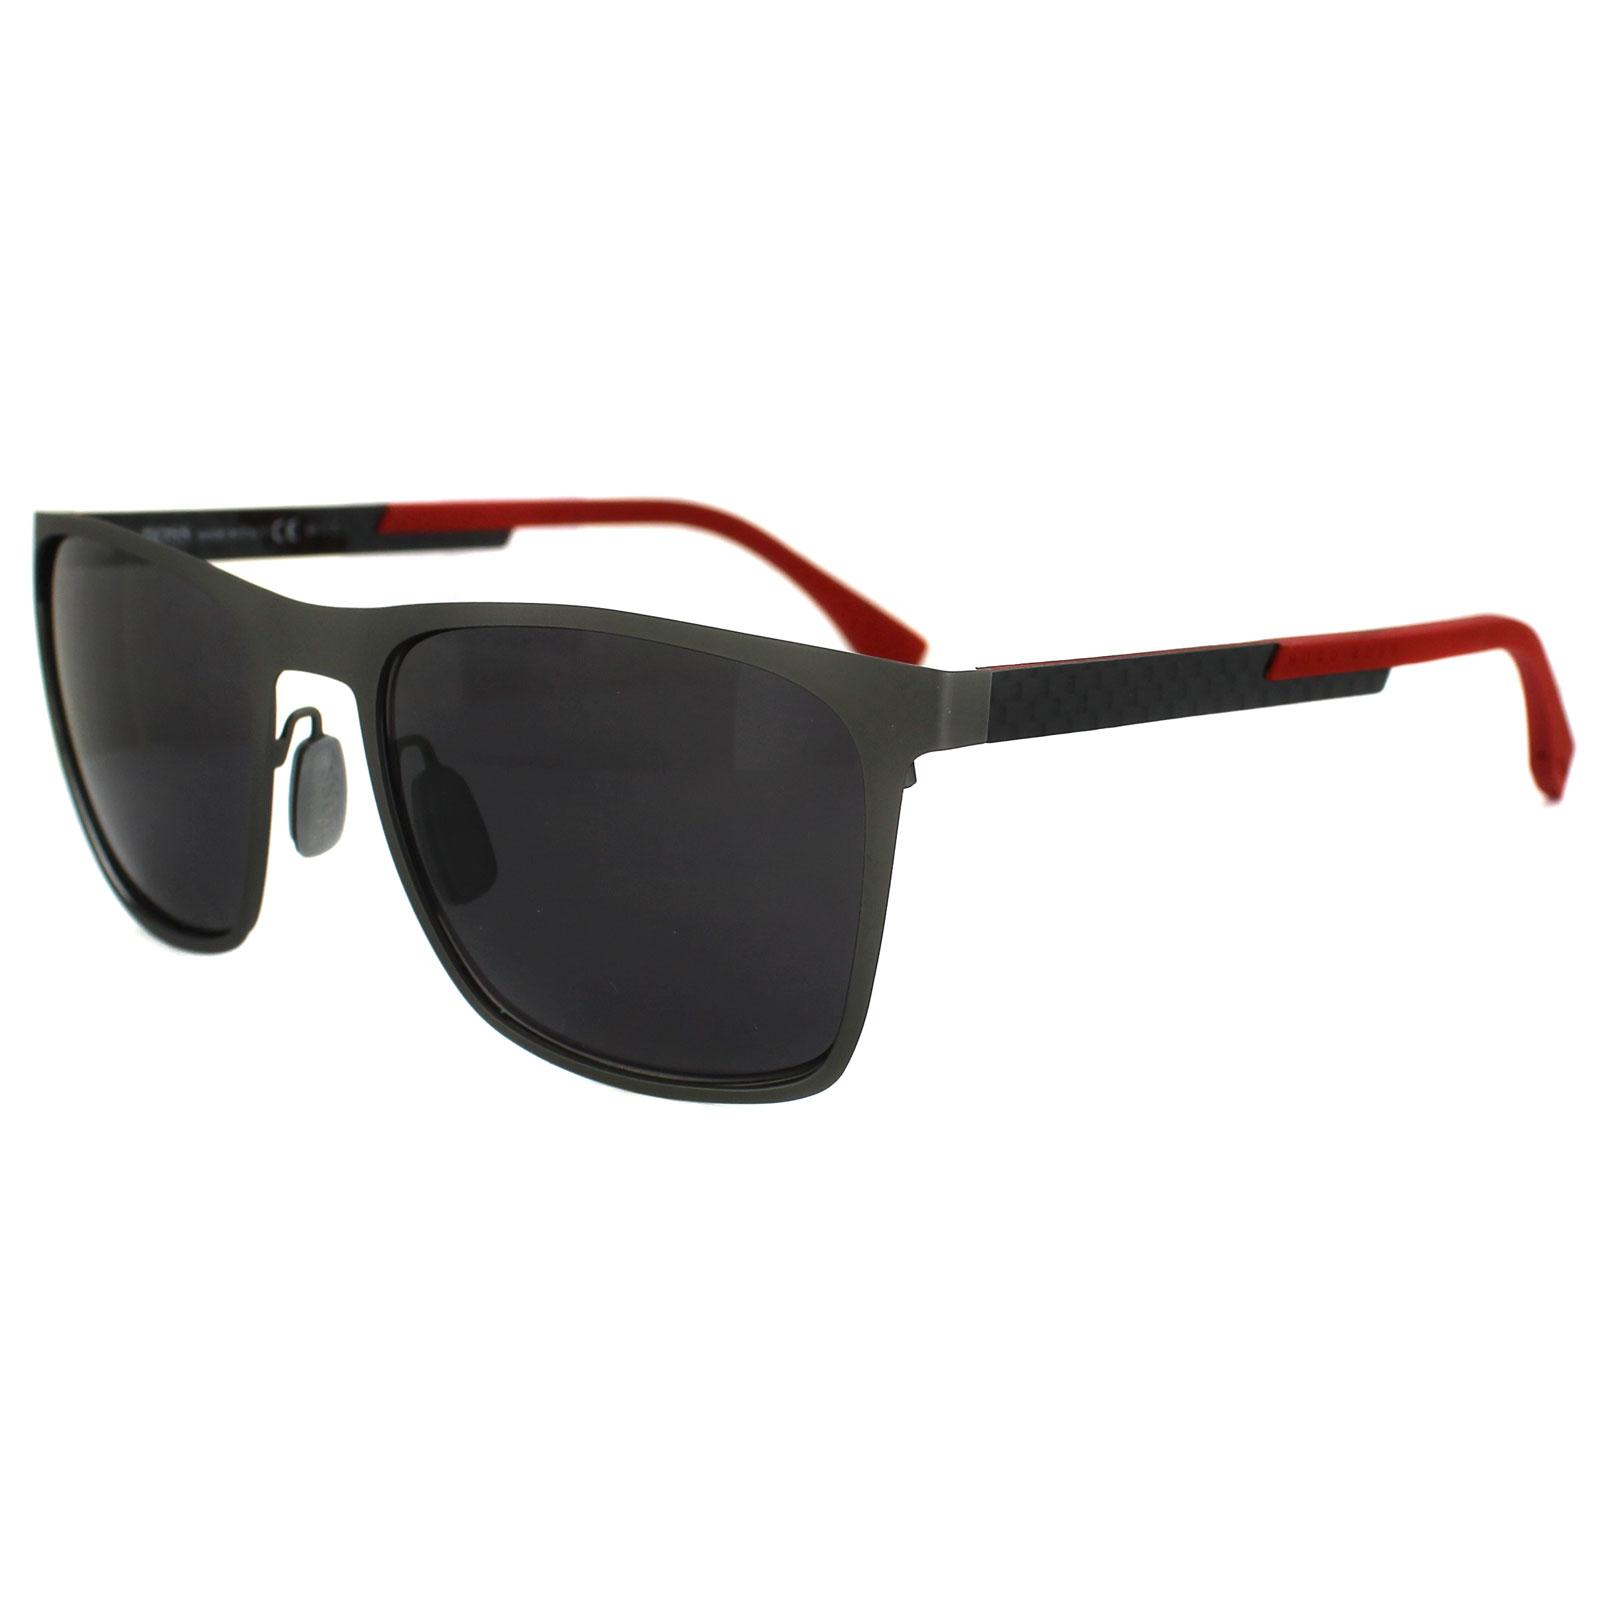 04c641d5880 Hugo Boss Polarized Glasses Uk - Psychopraticienne Bordeaux